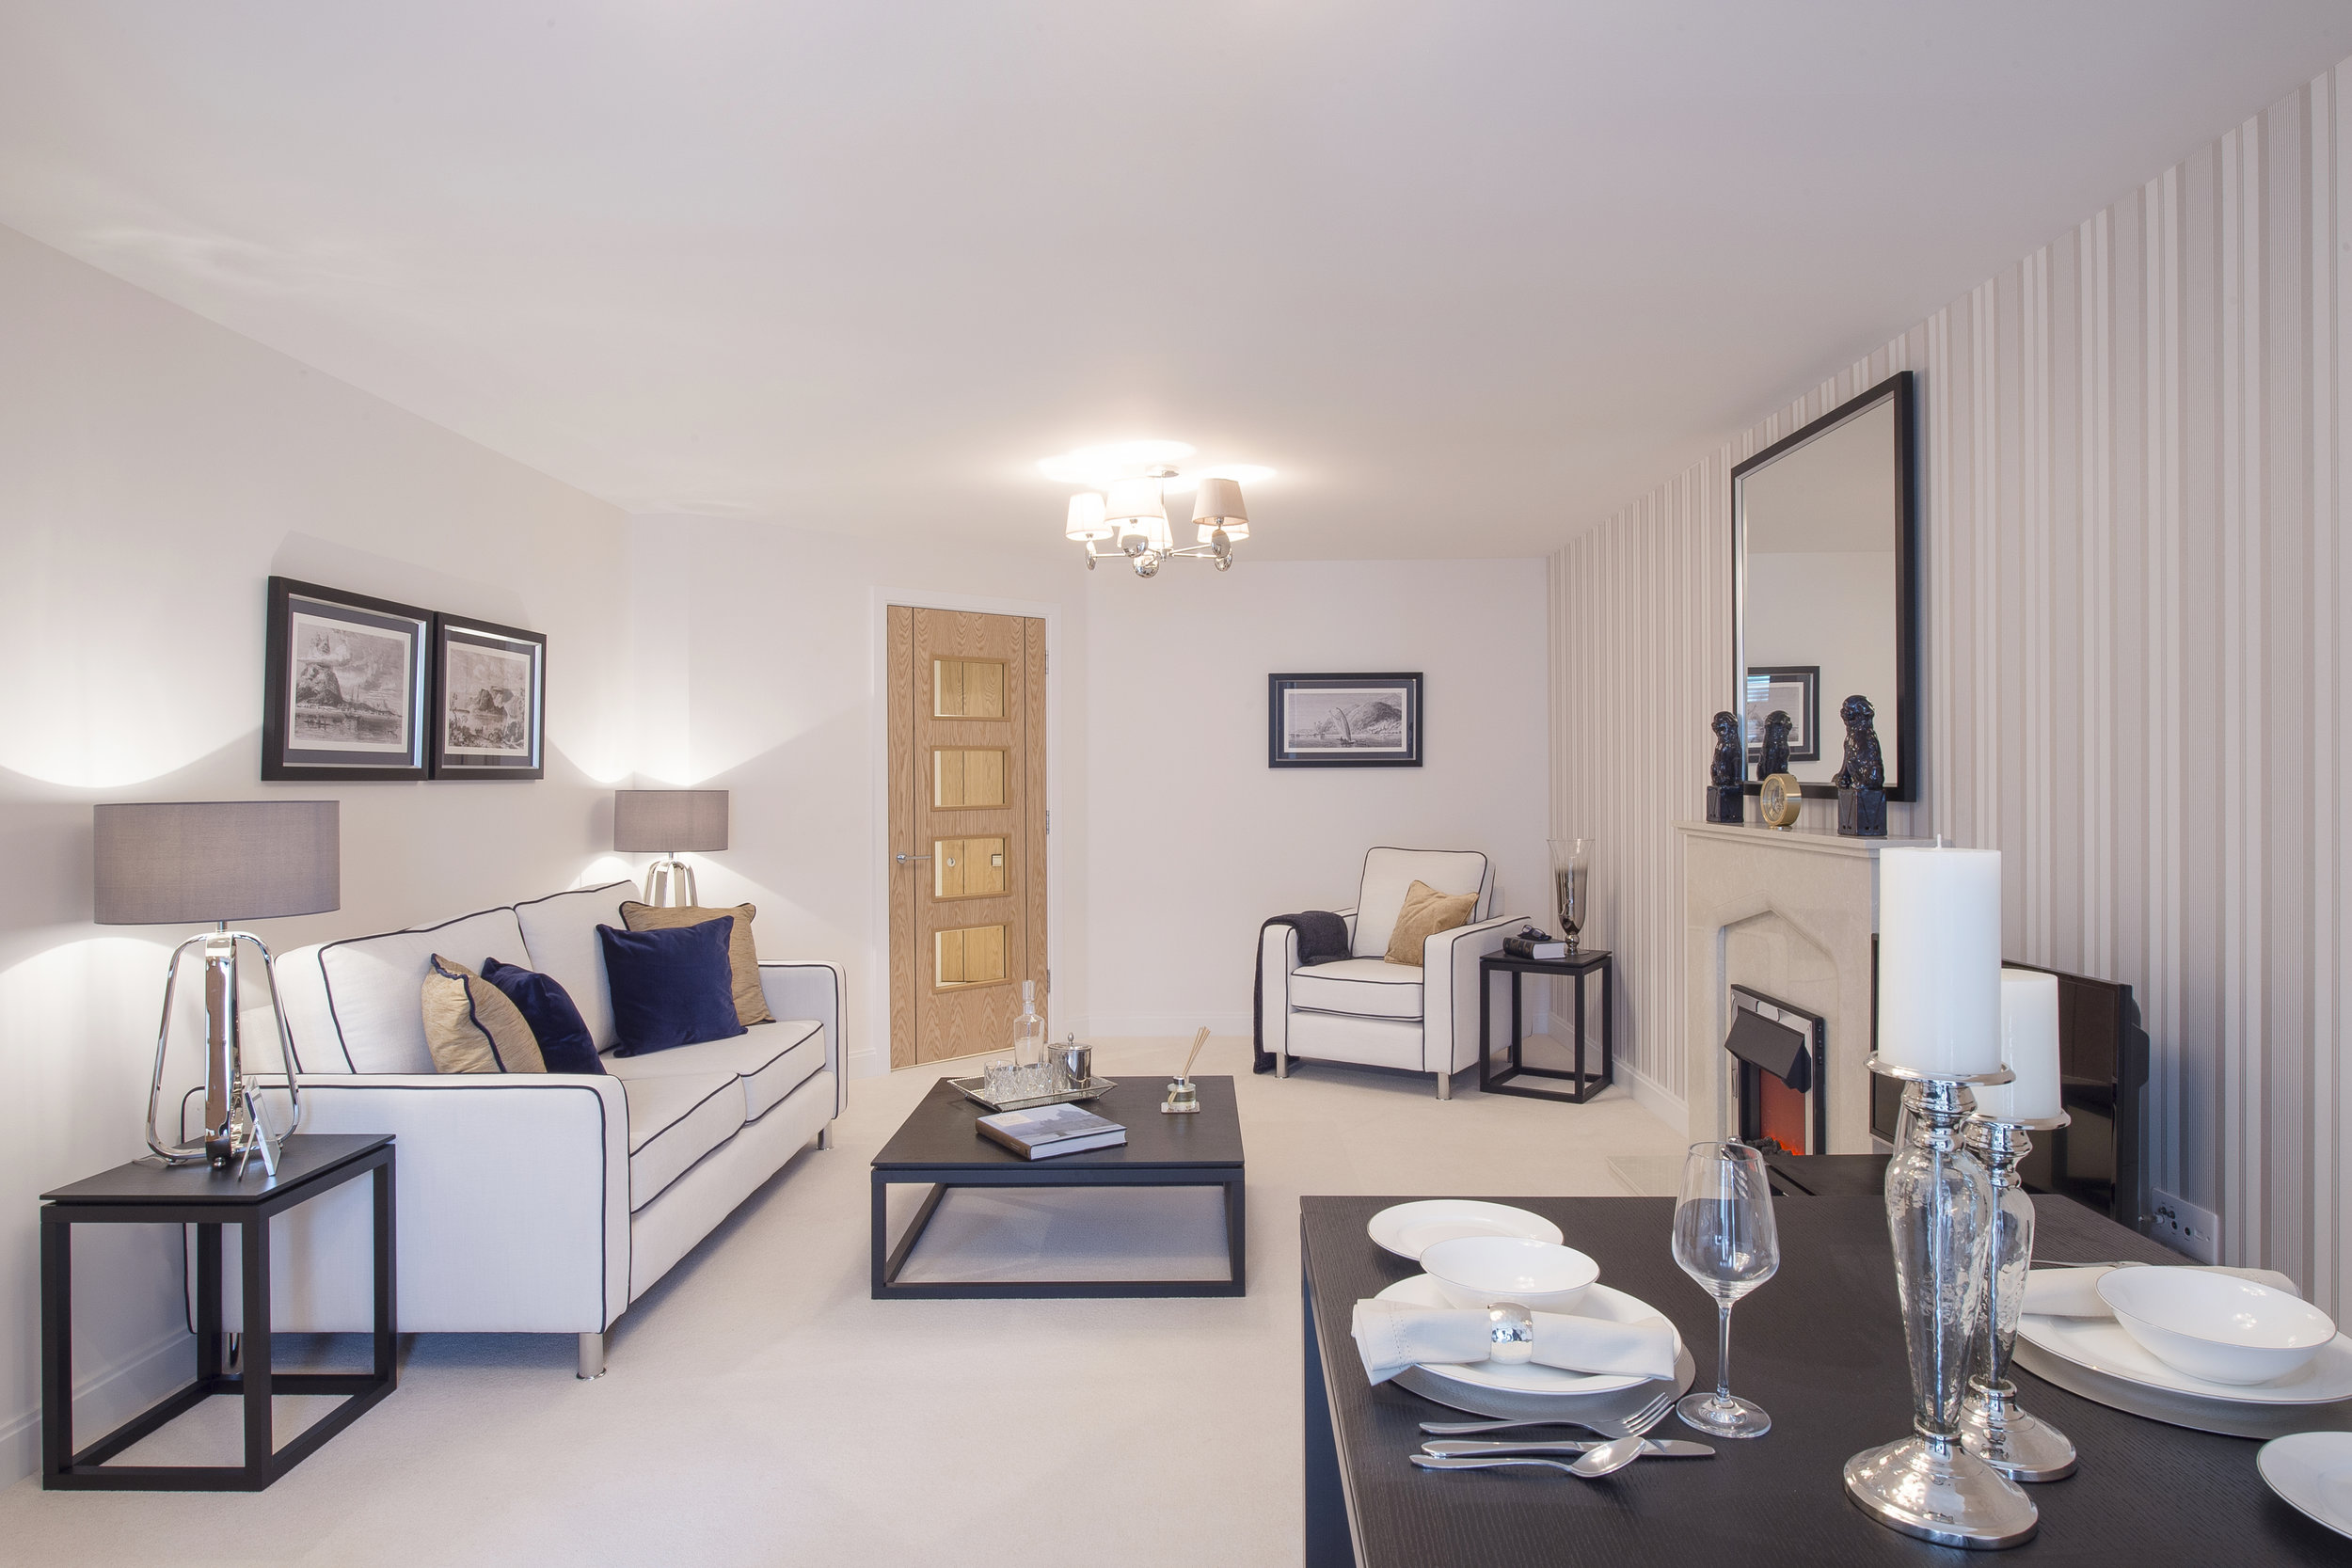 Hamble_livingroom.jpg